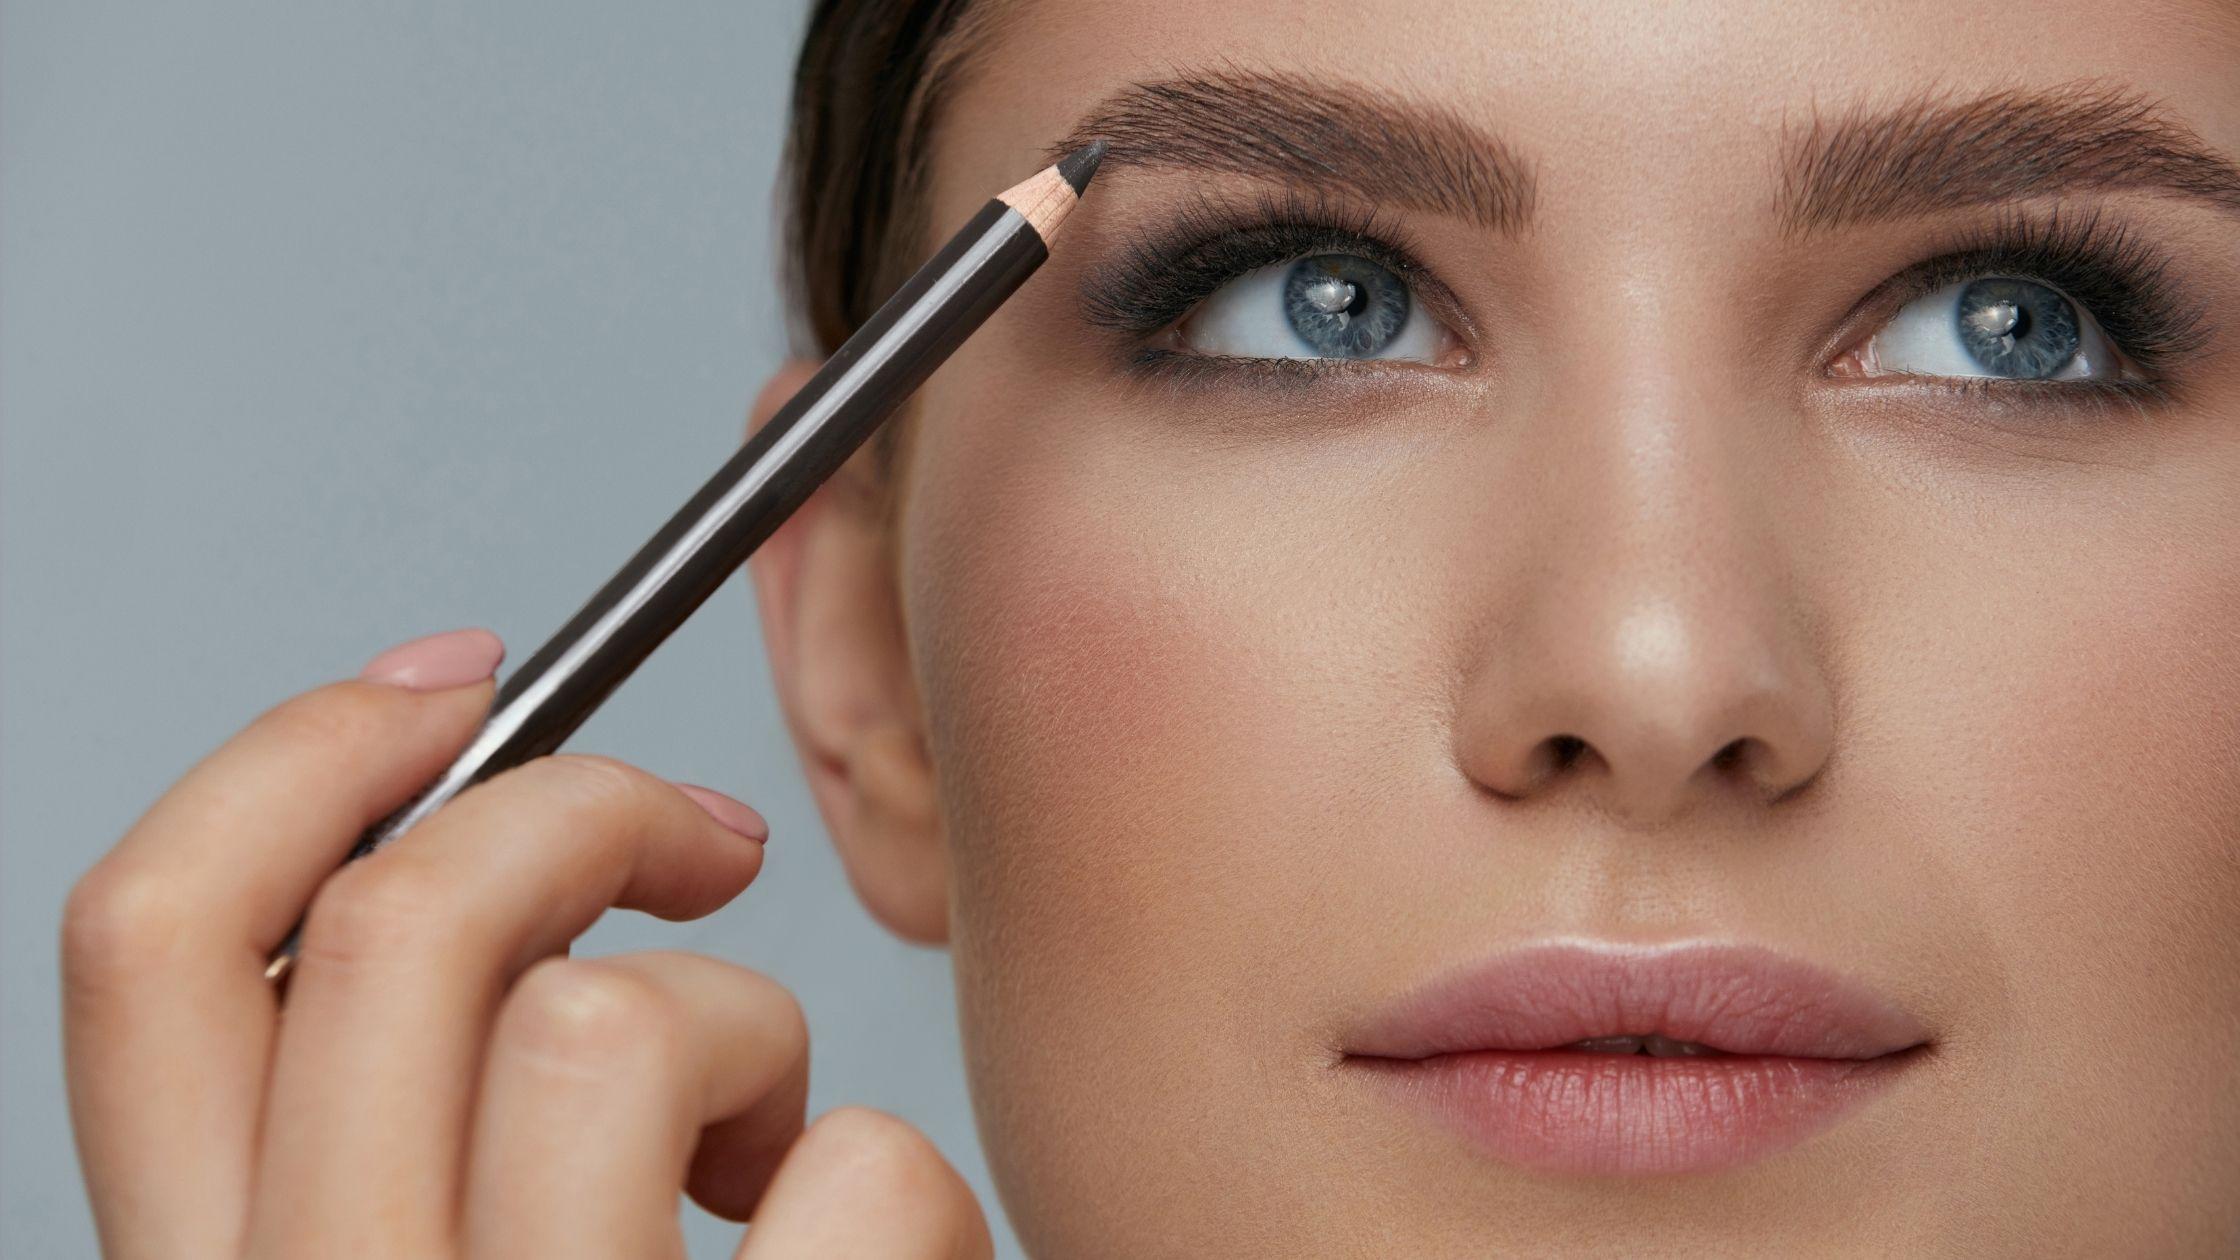 woman using an eyebrow pencil